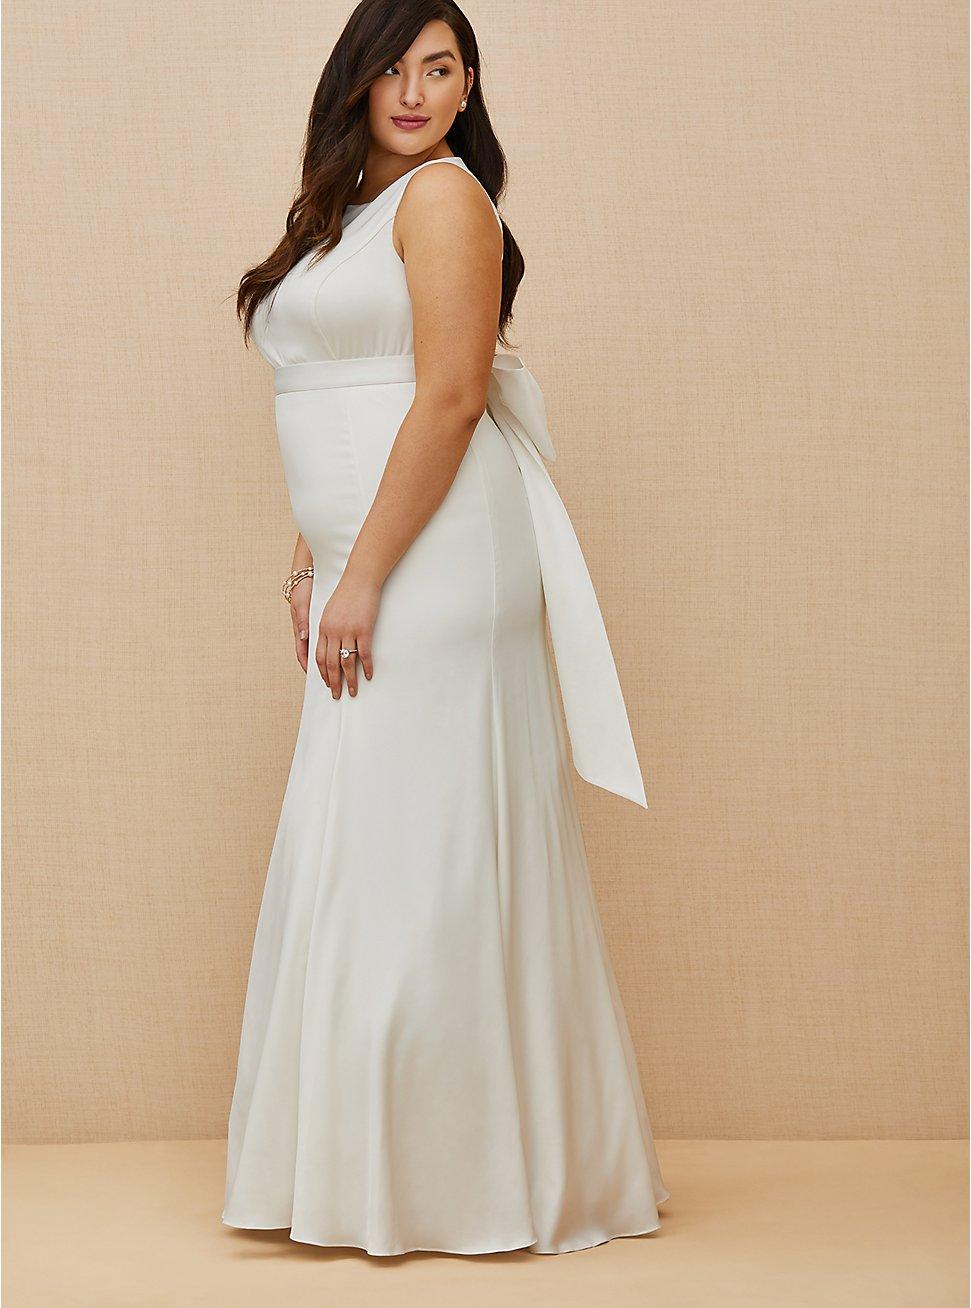 Ivory Satin Bow Back Mermaid Wedding Dress, , fitModel1-hires